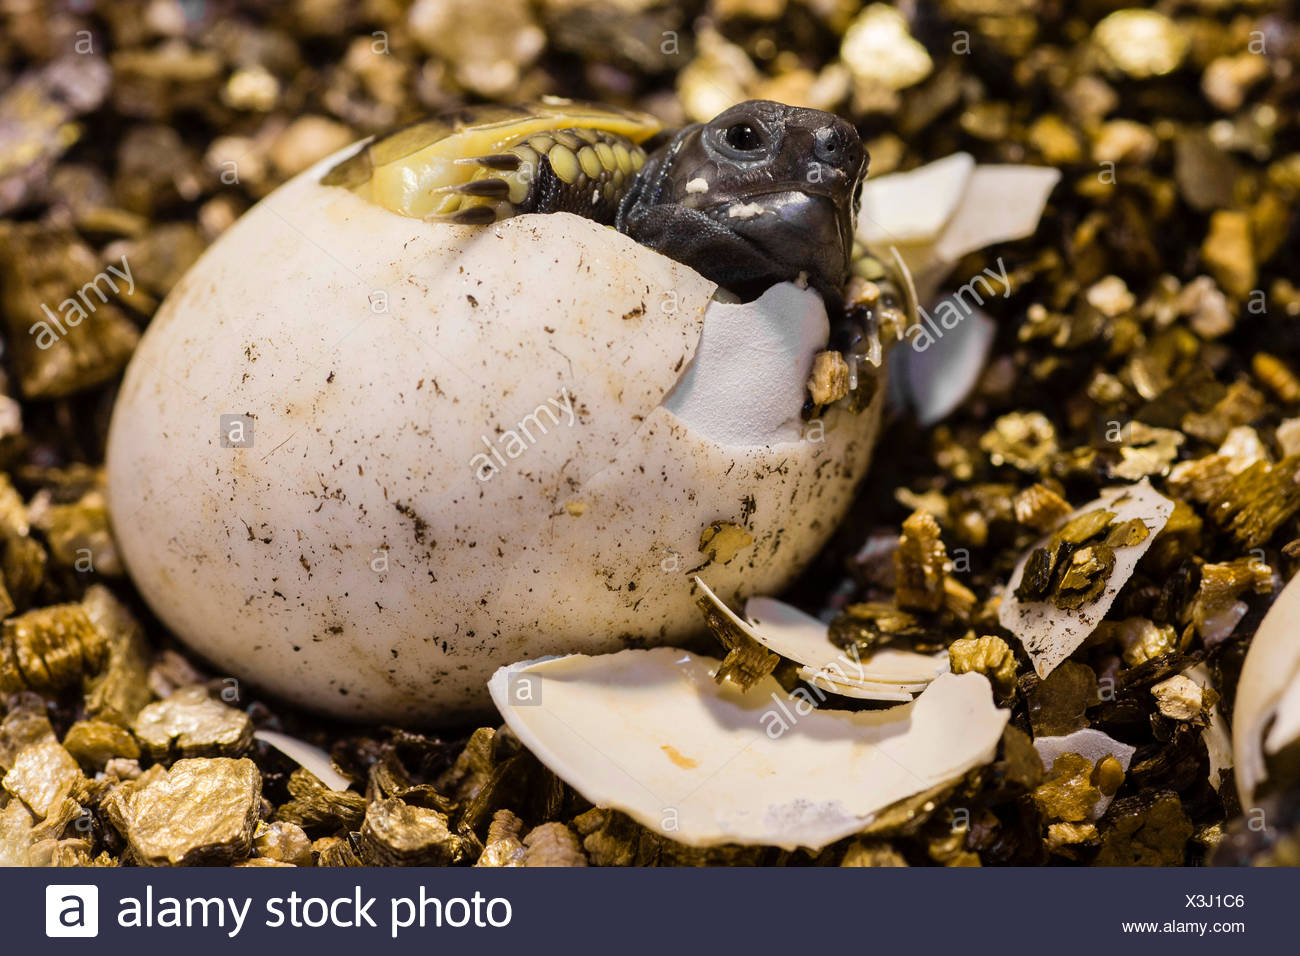 Hermann's tortoise, Greek tortoise (Testudo hermanni), hatching from the egg, Germany - Stock Image